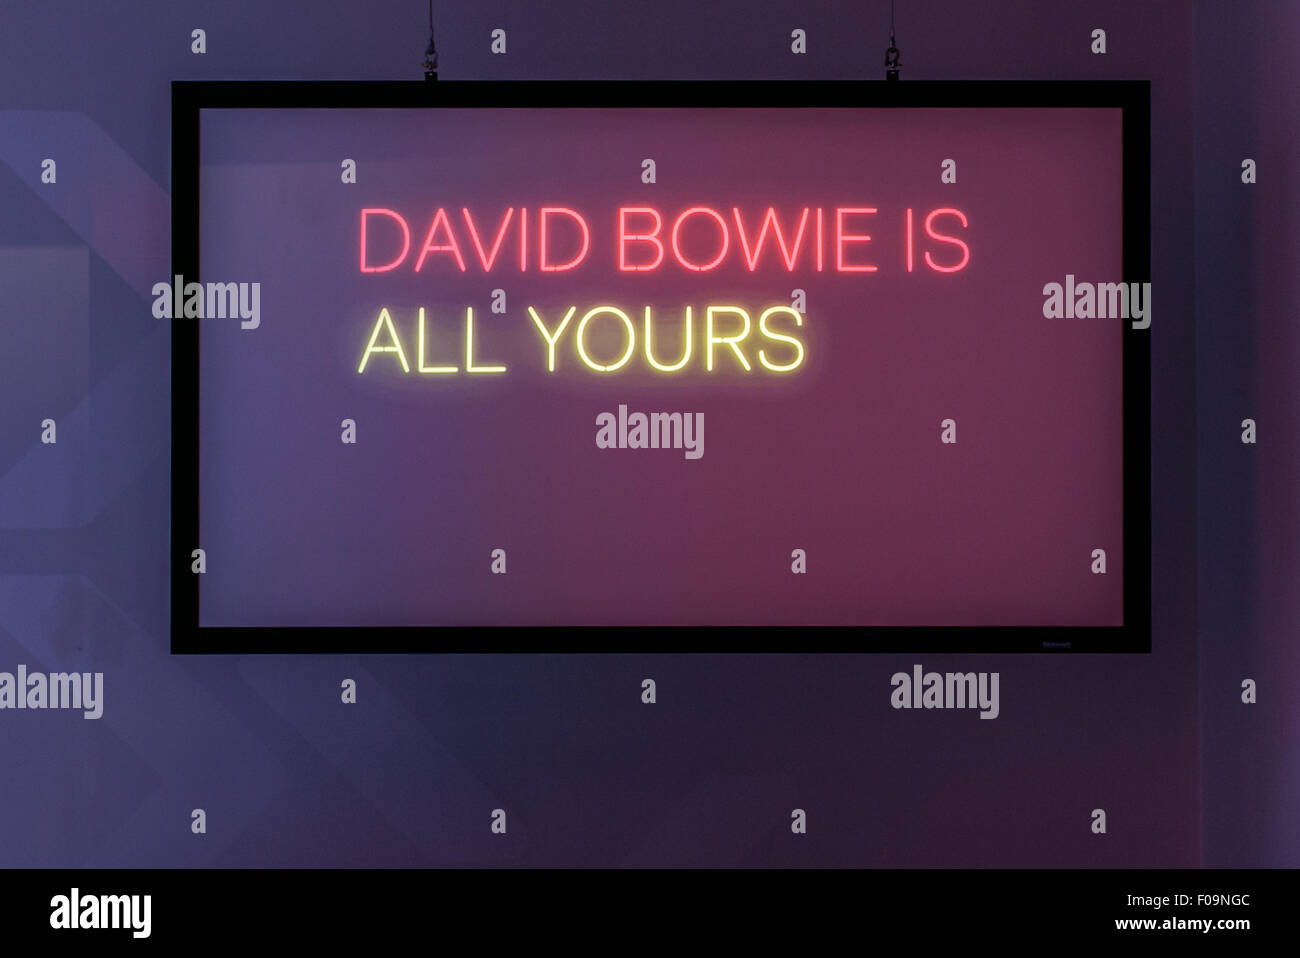 V&A David Bowie es exposición de ACMI, Melbourne, Australia Imagen De Stock